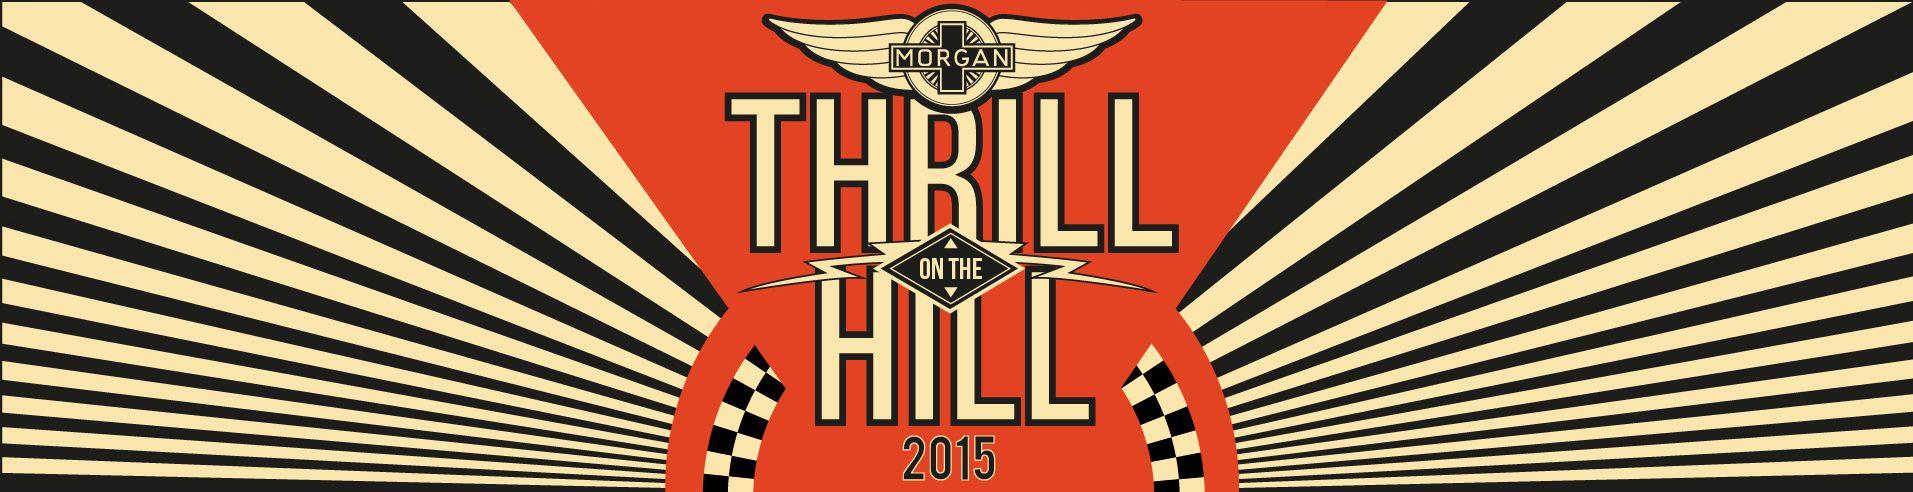 Thrill_Banner-full-compressor